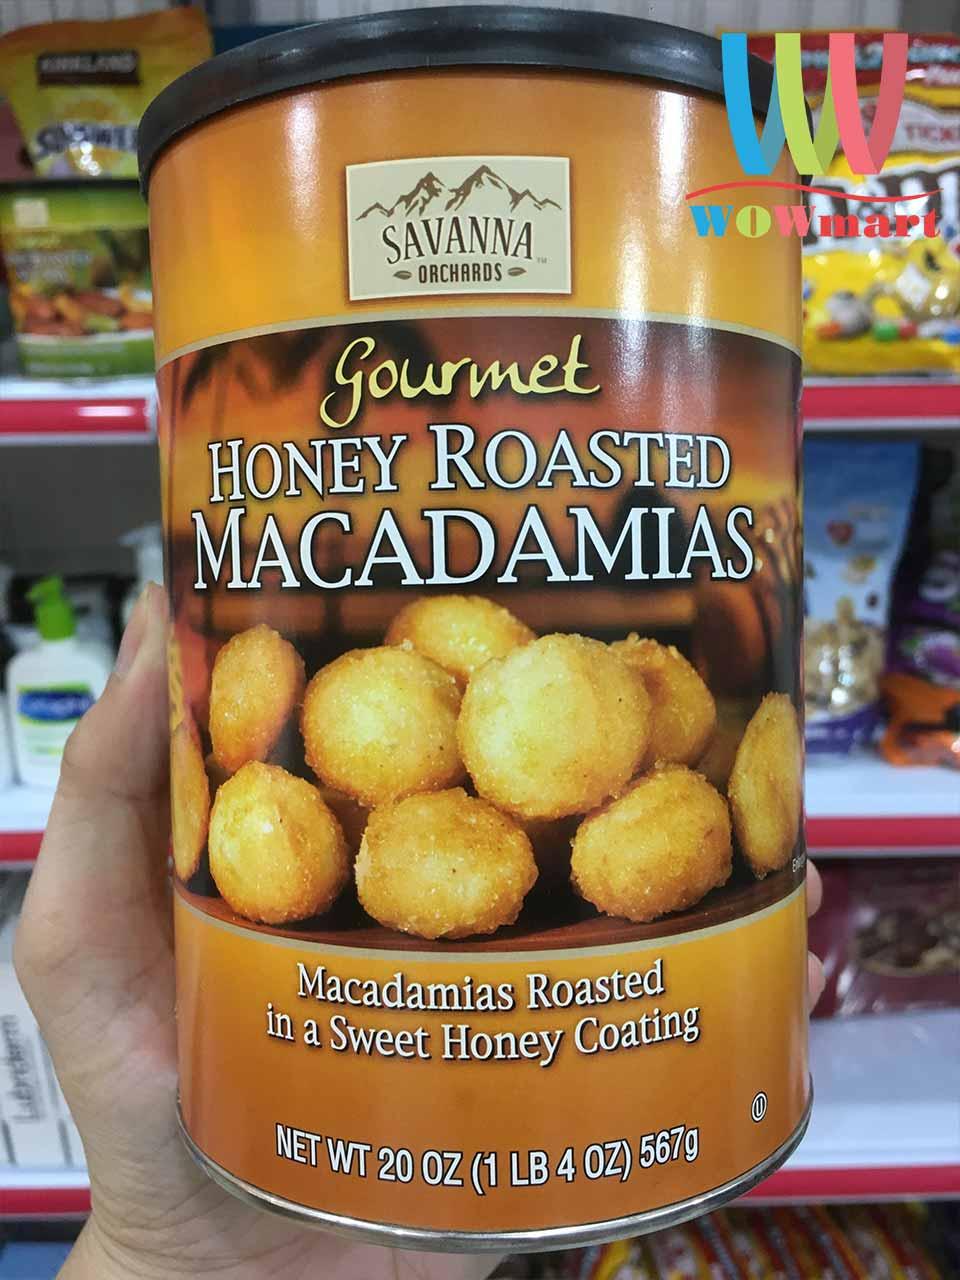 Hạt mắc ca tẩm mật ong Savanna Gourmet Honey Roasted Macadamias 567g